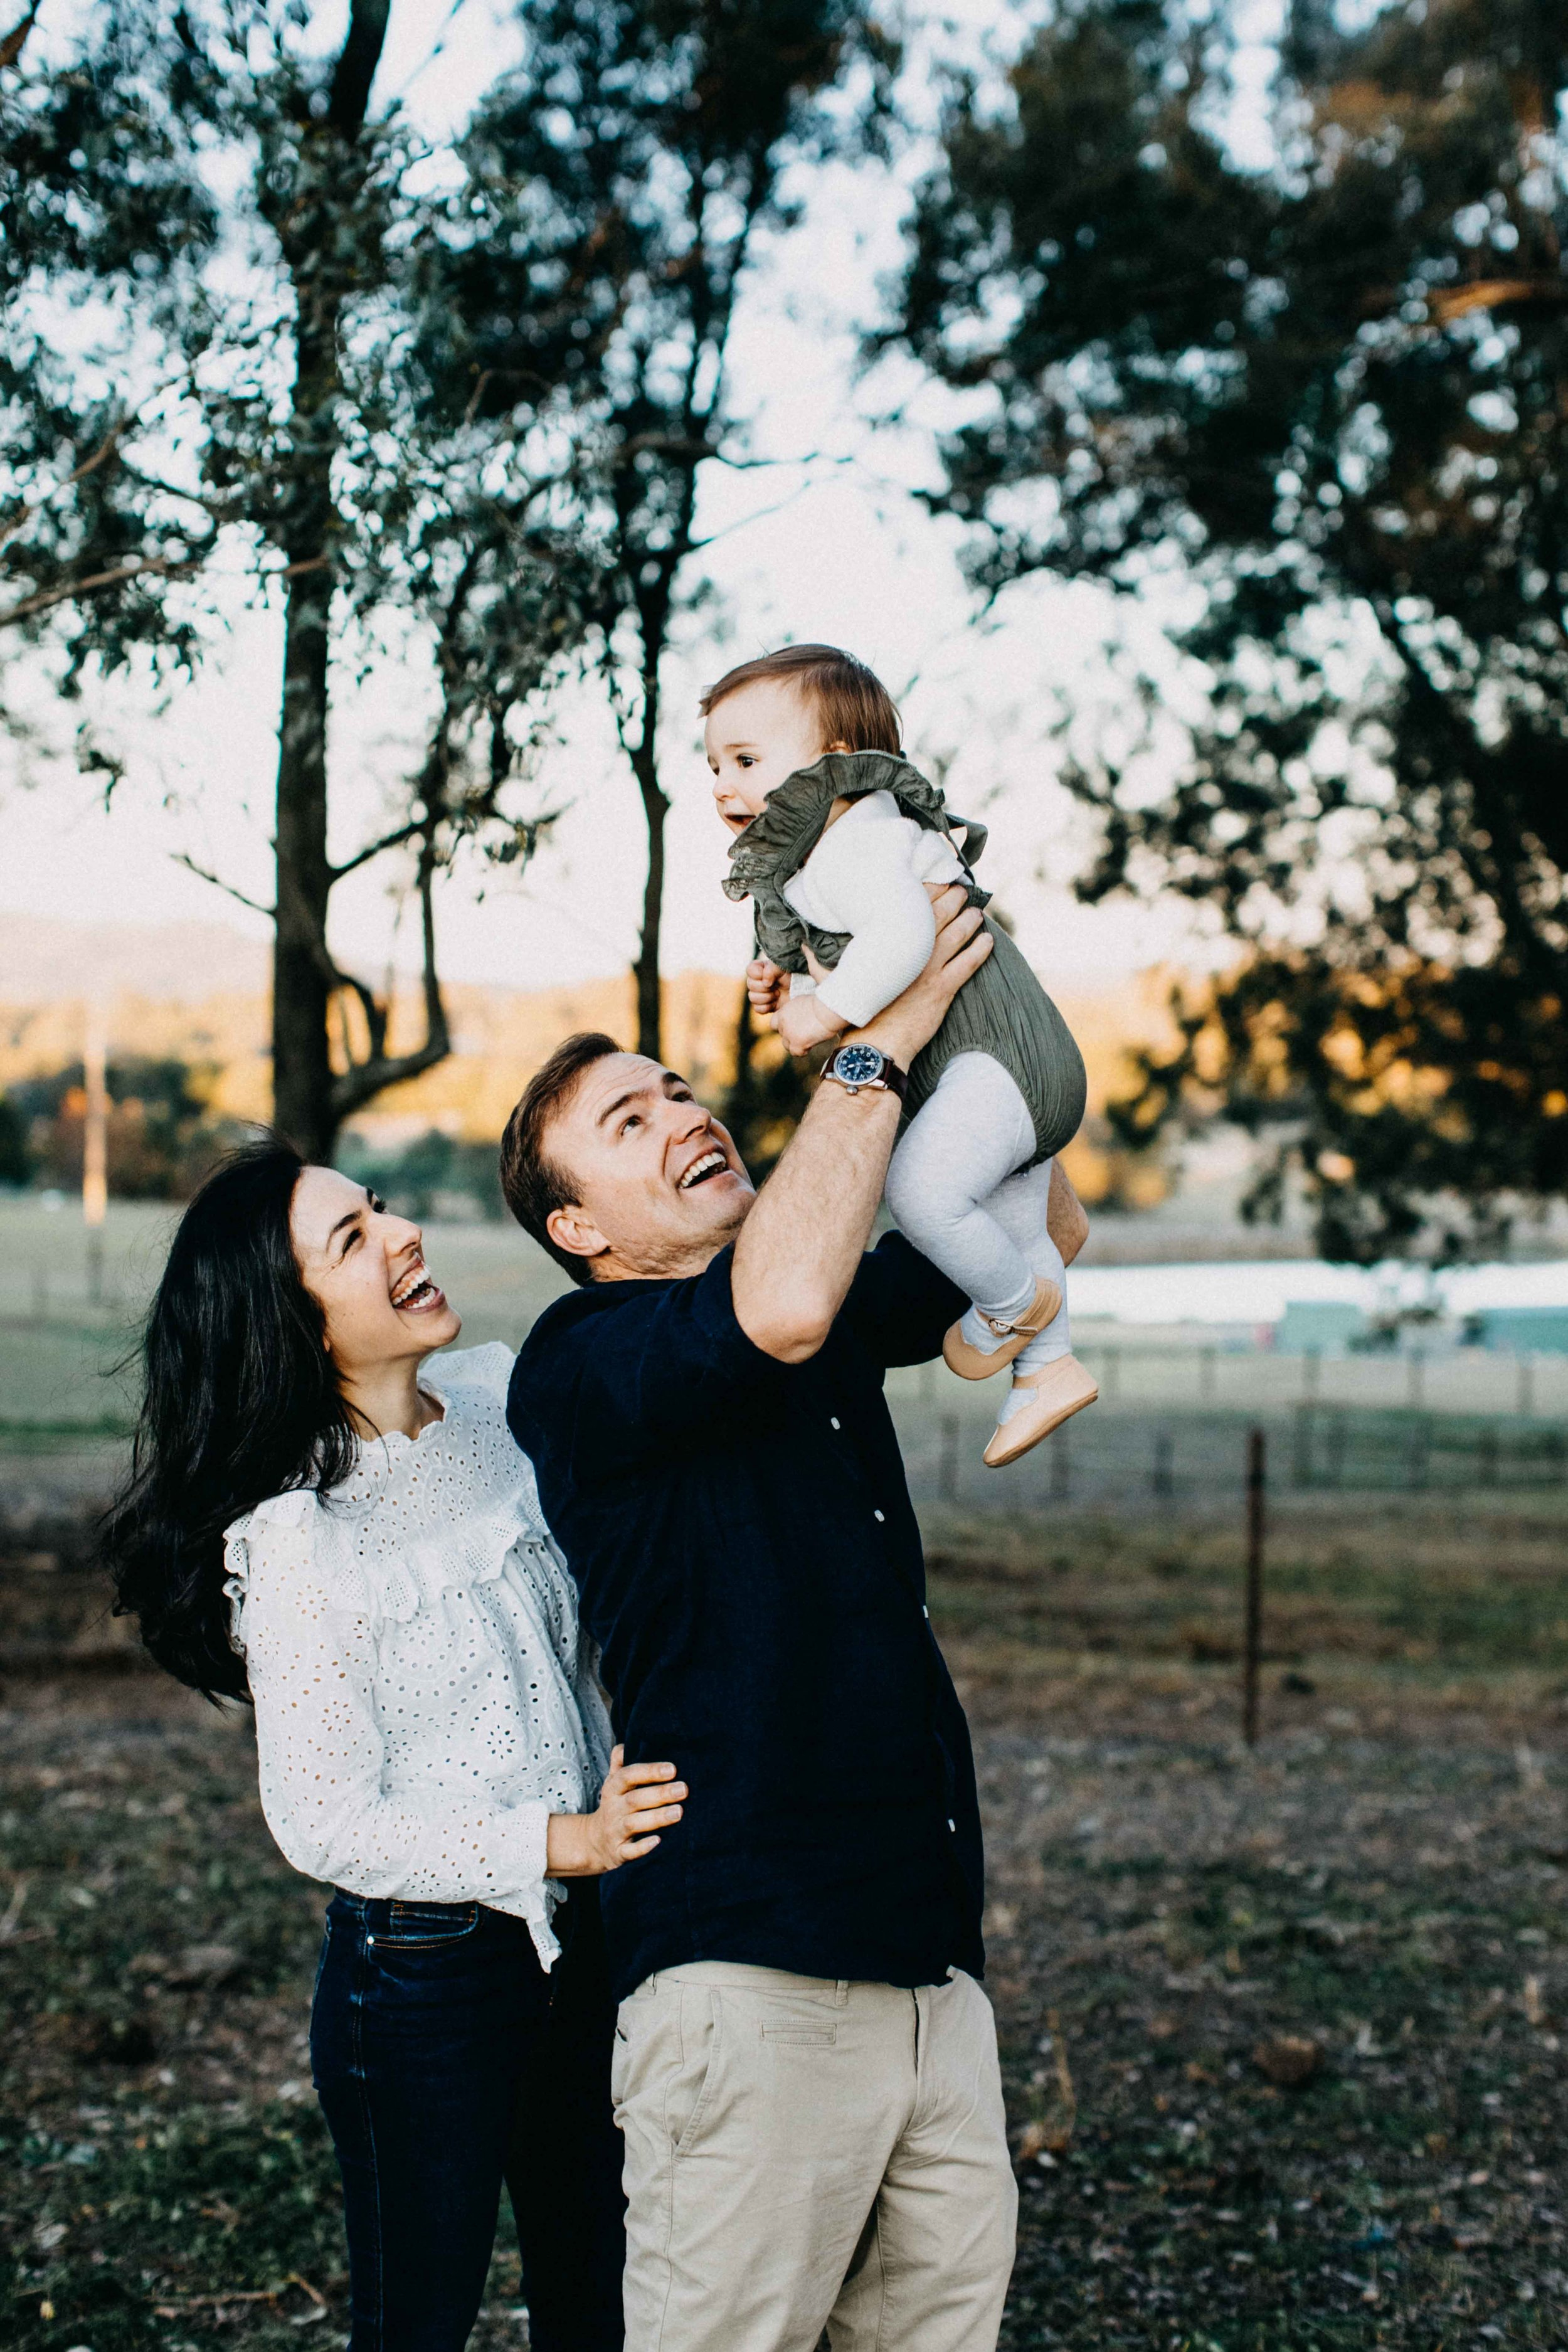 camden-family-photography-galea-www.emilyobrienphotography.net-23.jpg